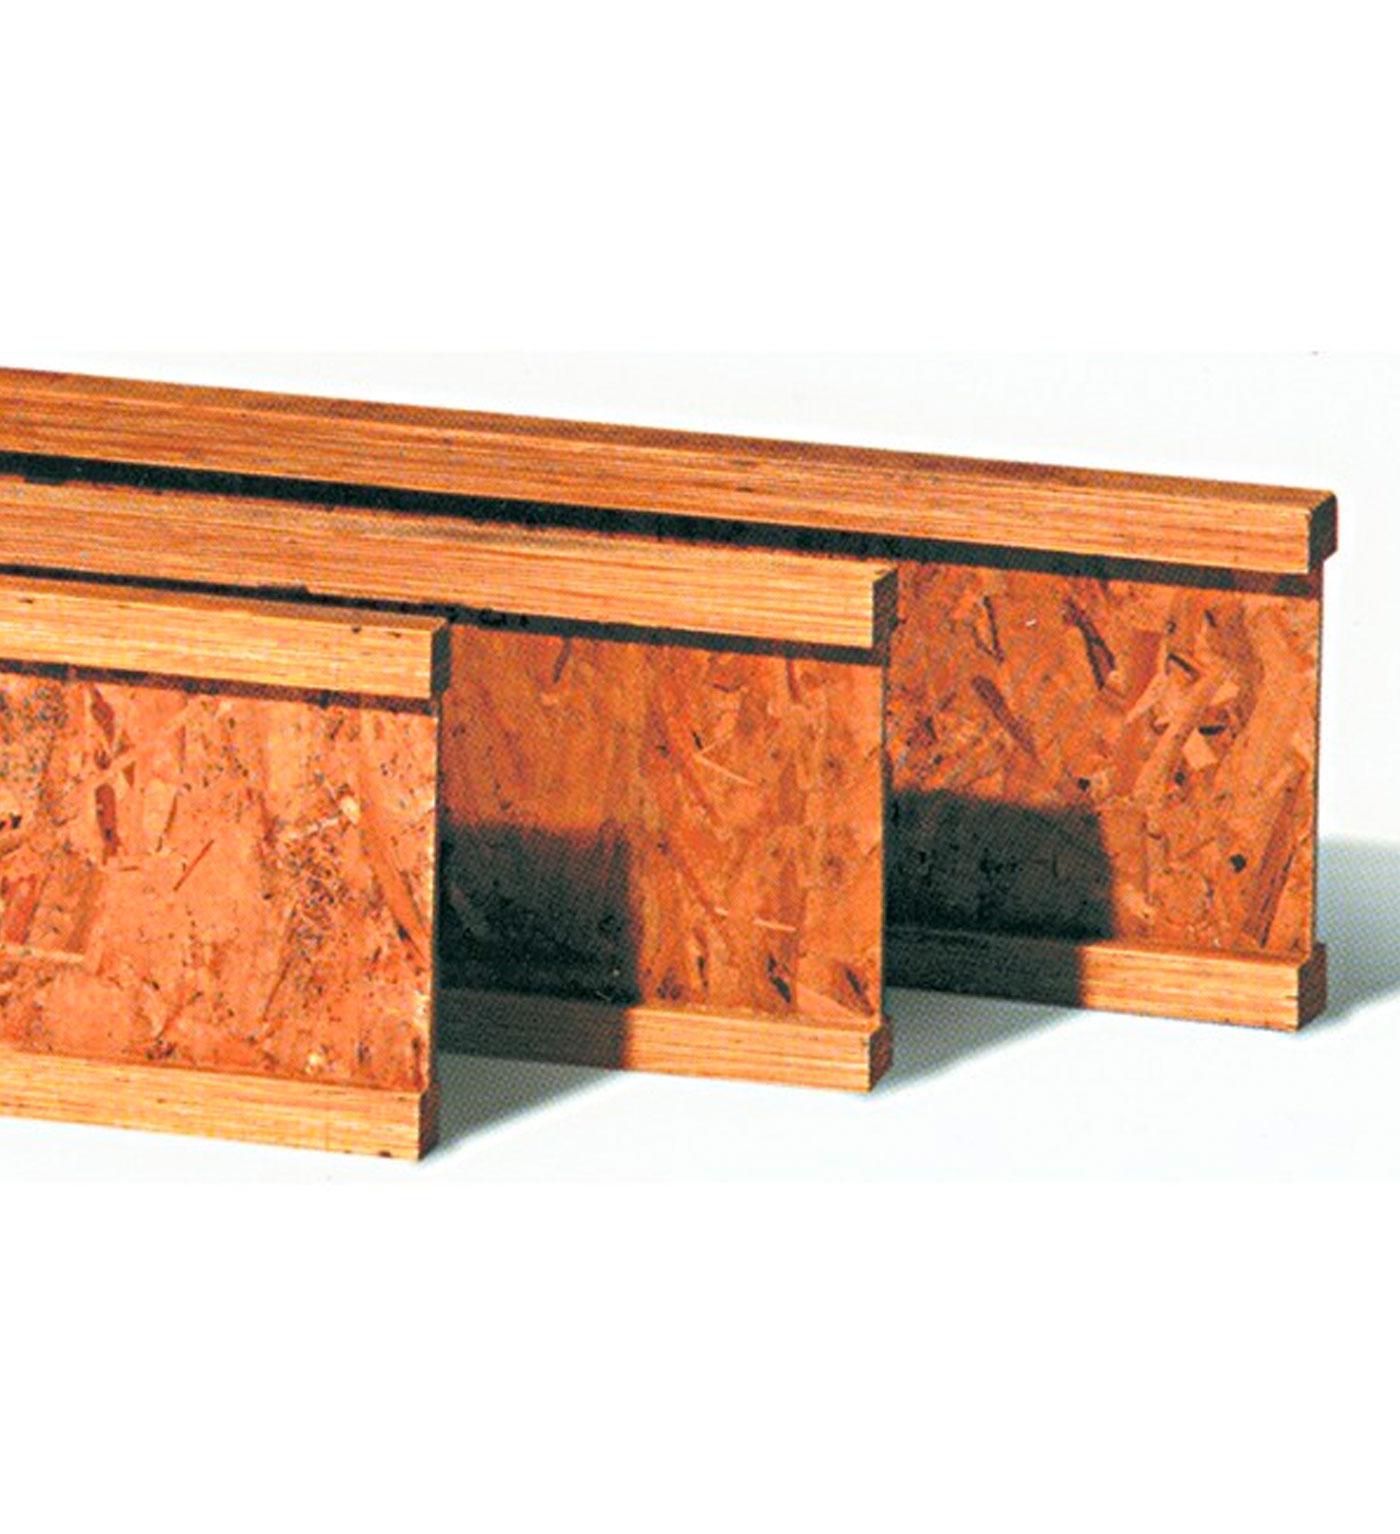 special-order-engineered-lumber-supply-store-eureka-ca-humboldt-county-california